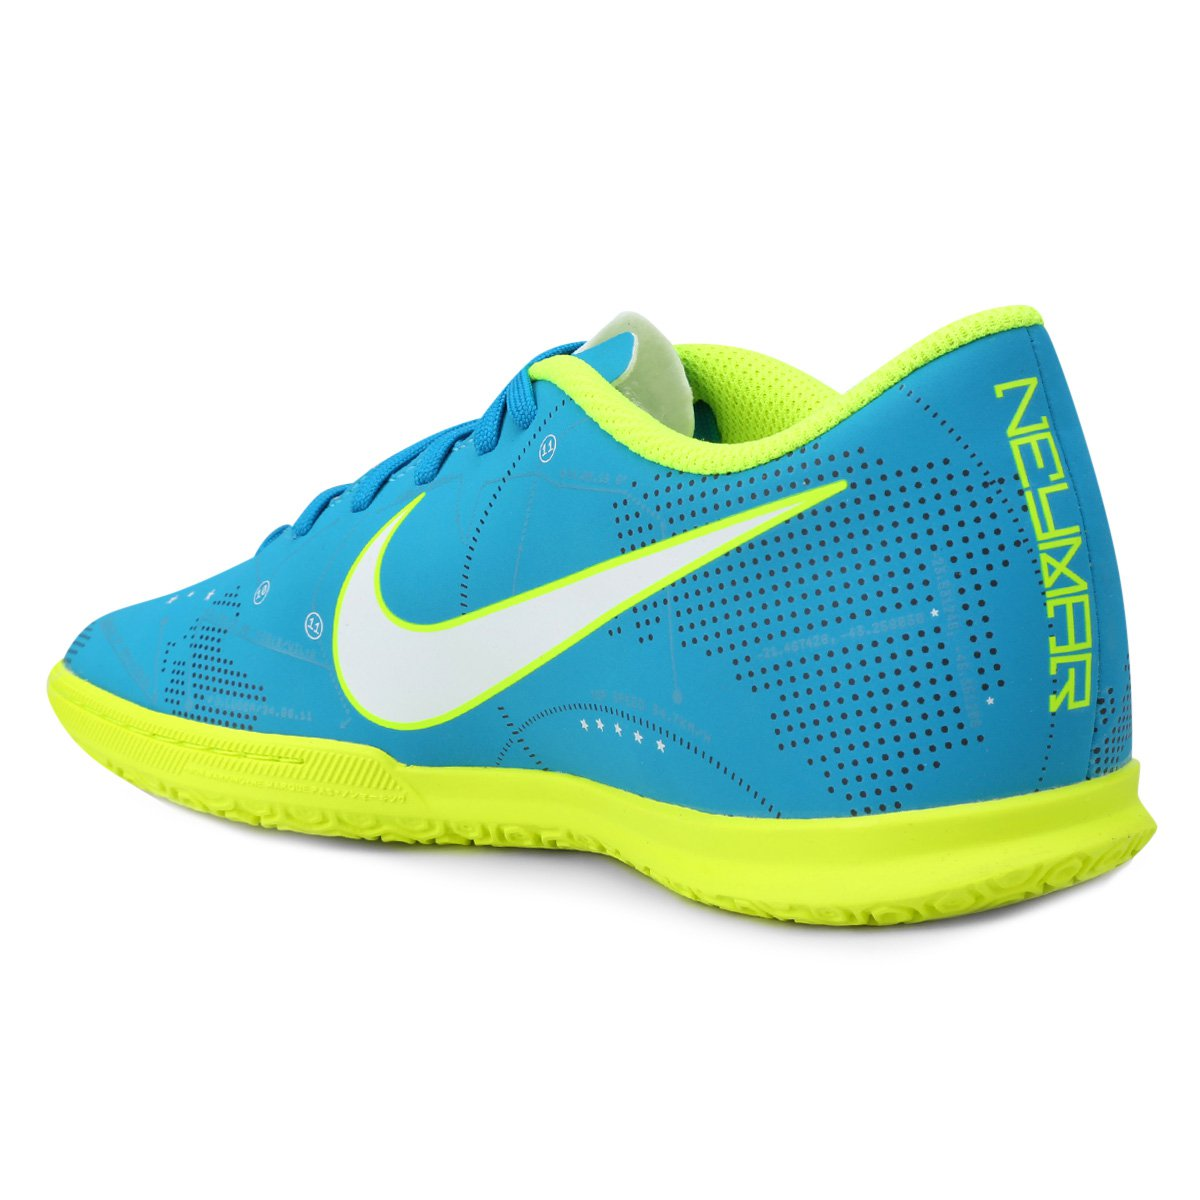 Chuteira Futsal Nike Mercurial Vortex 3 Neymar Jr IC - Compre Agora ... 28386c54e7ae6